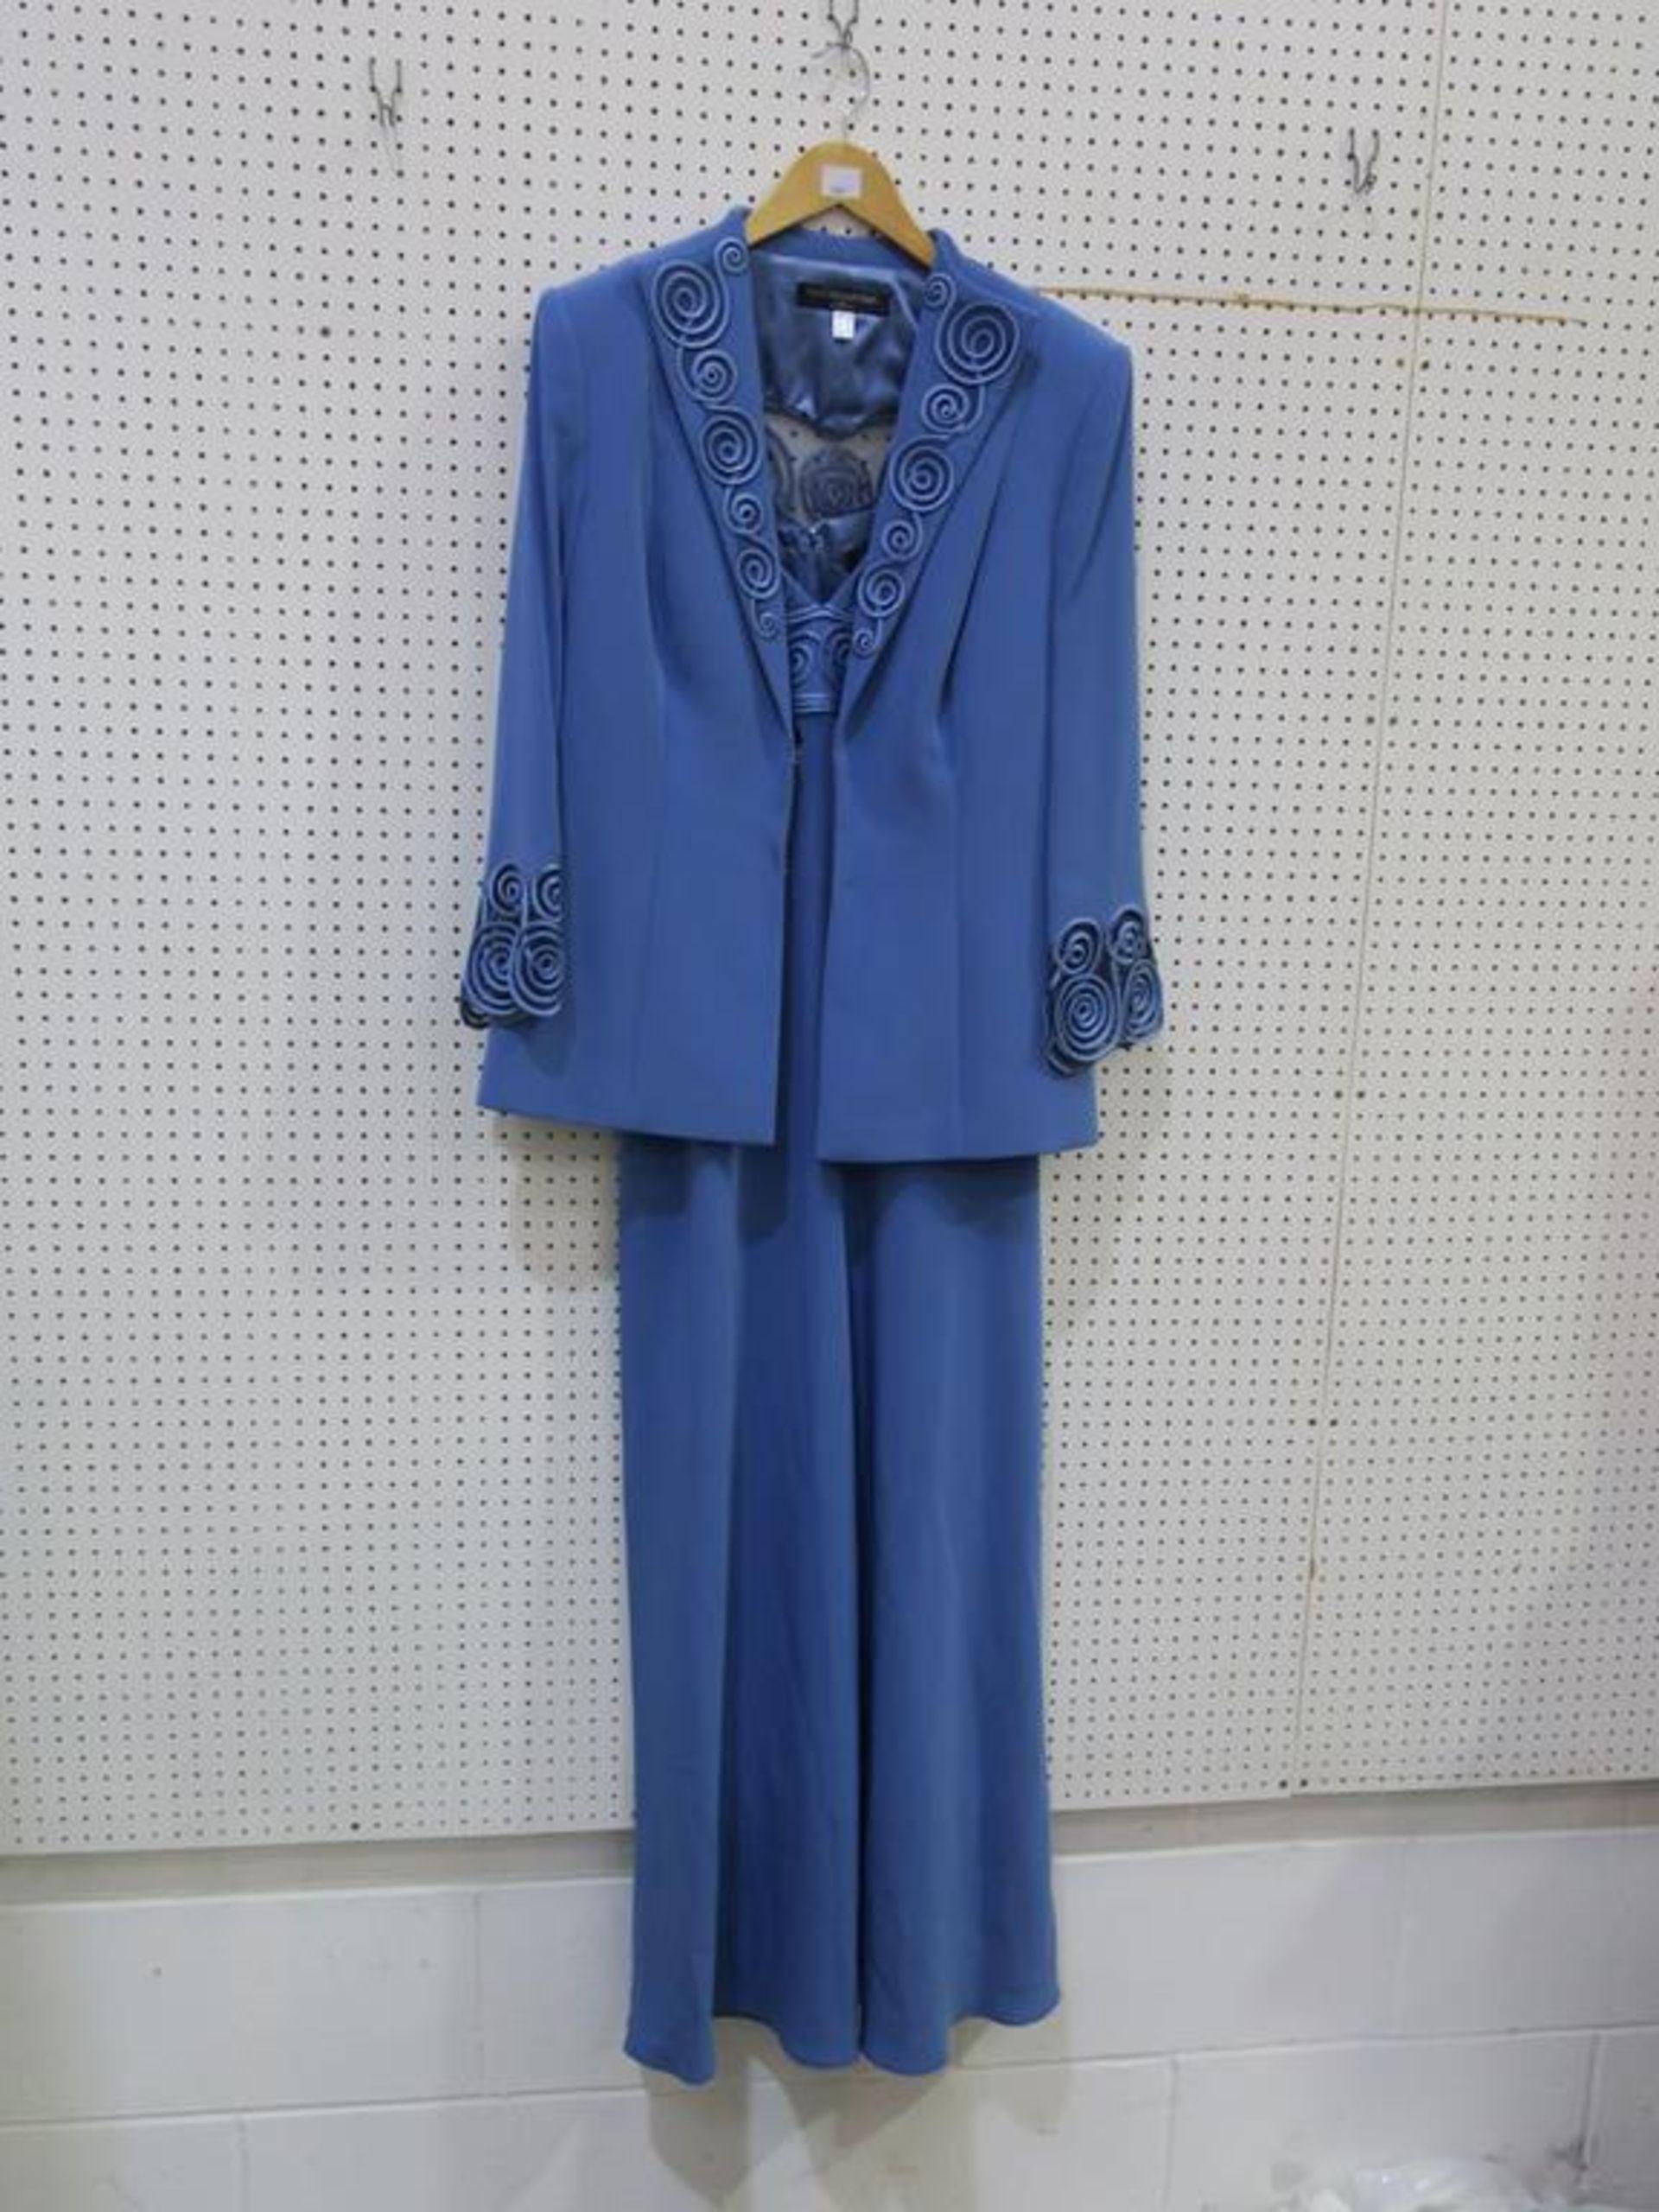 Lot 8043 - * Three Ladies Garments. A Veni Infantino (size 16), a Luis Civit (size 16, RRP £359) and a